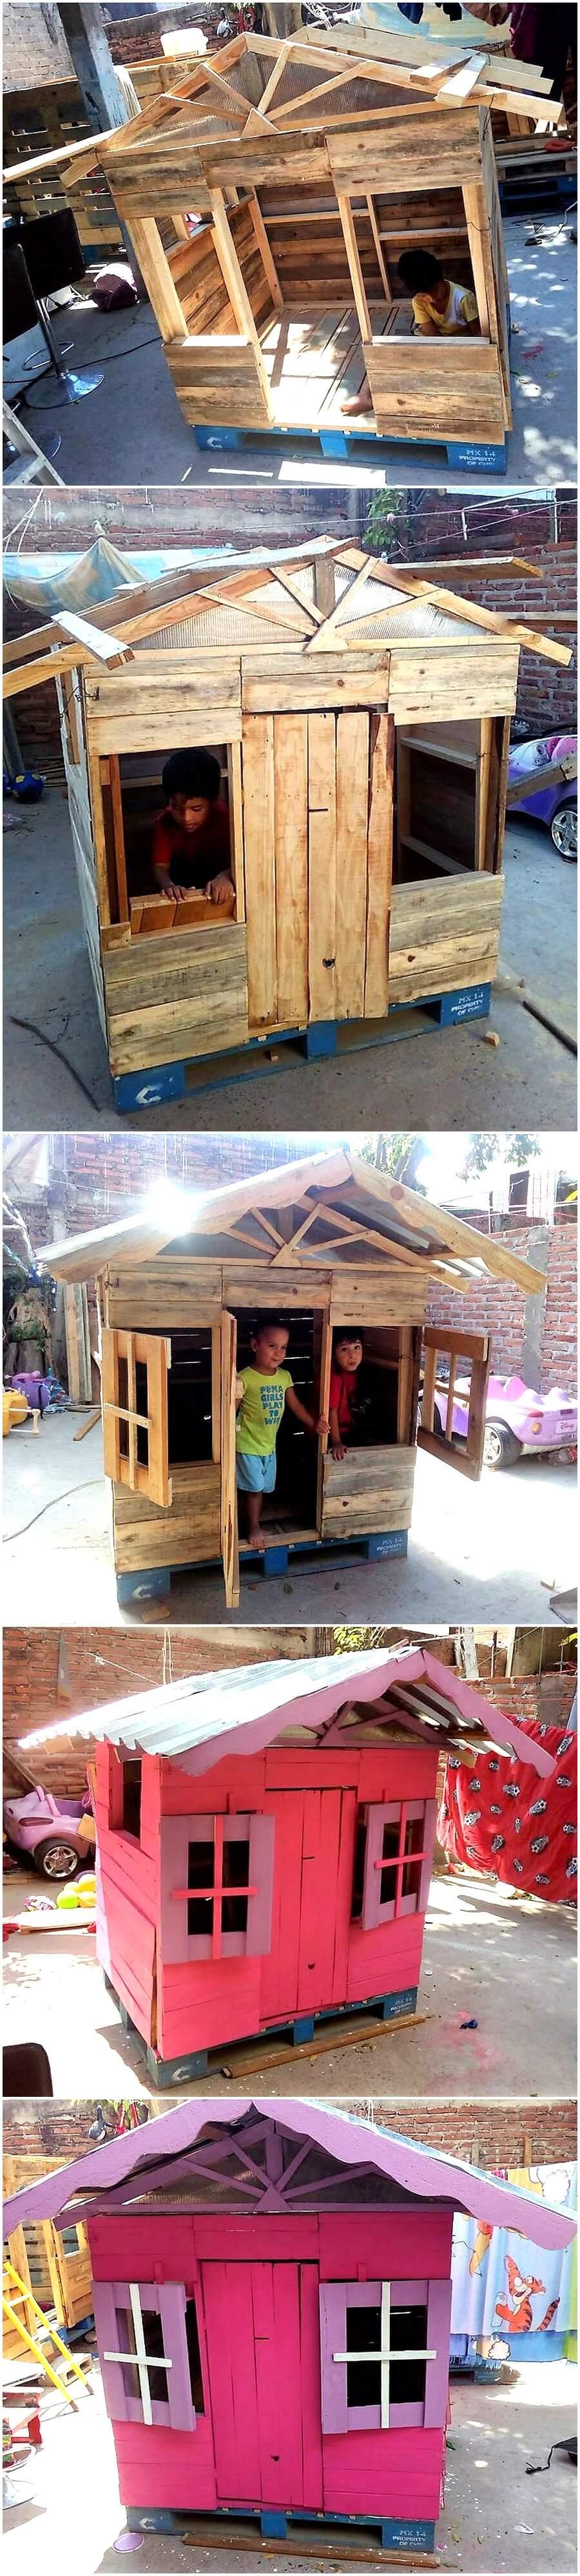 Repurposed Wood Pallets Kids Playhouse Cabin